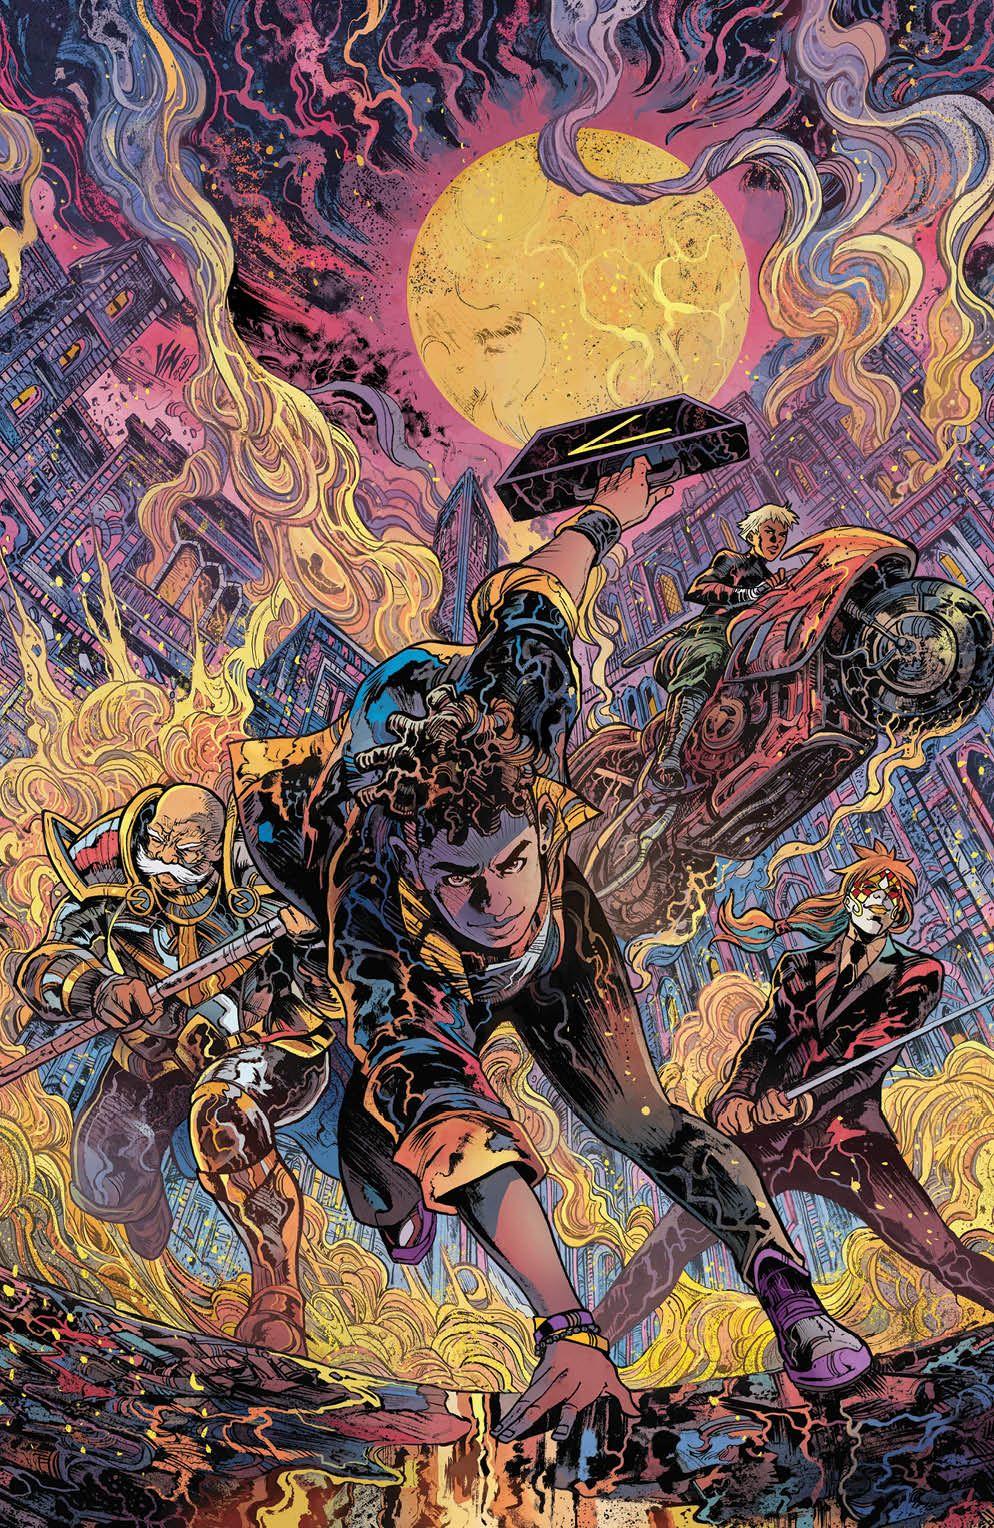 SevenSecrets_008_Cover_D_Variant ComicList Previews: SEVEN SECRETS #8